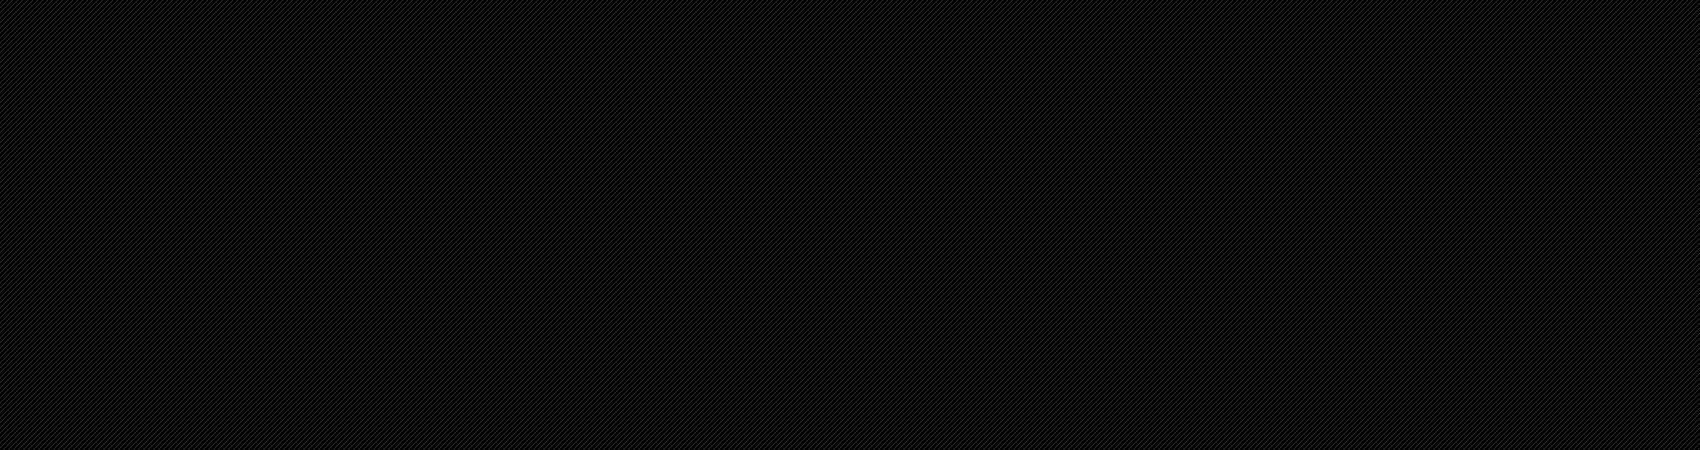 background-black